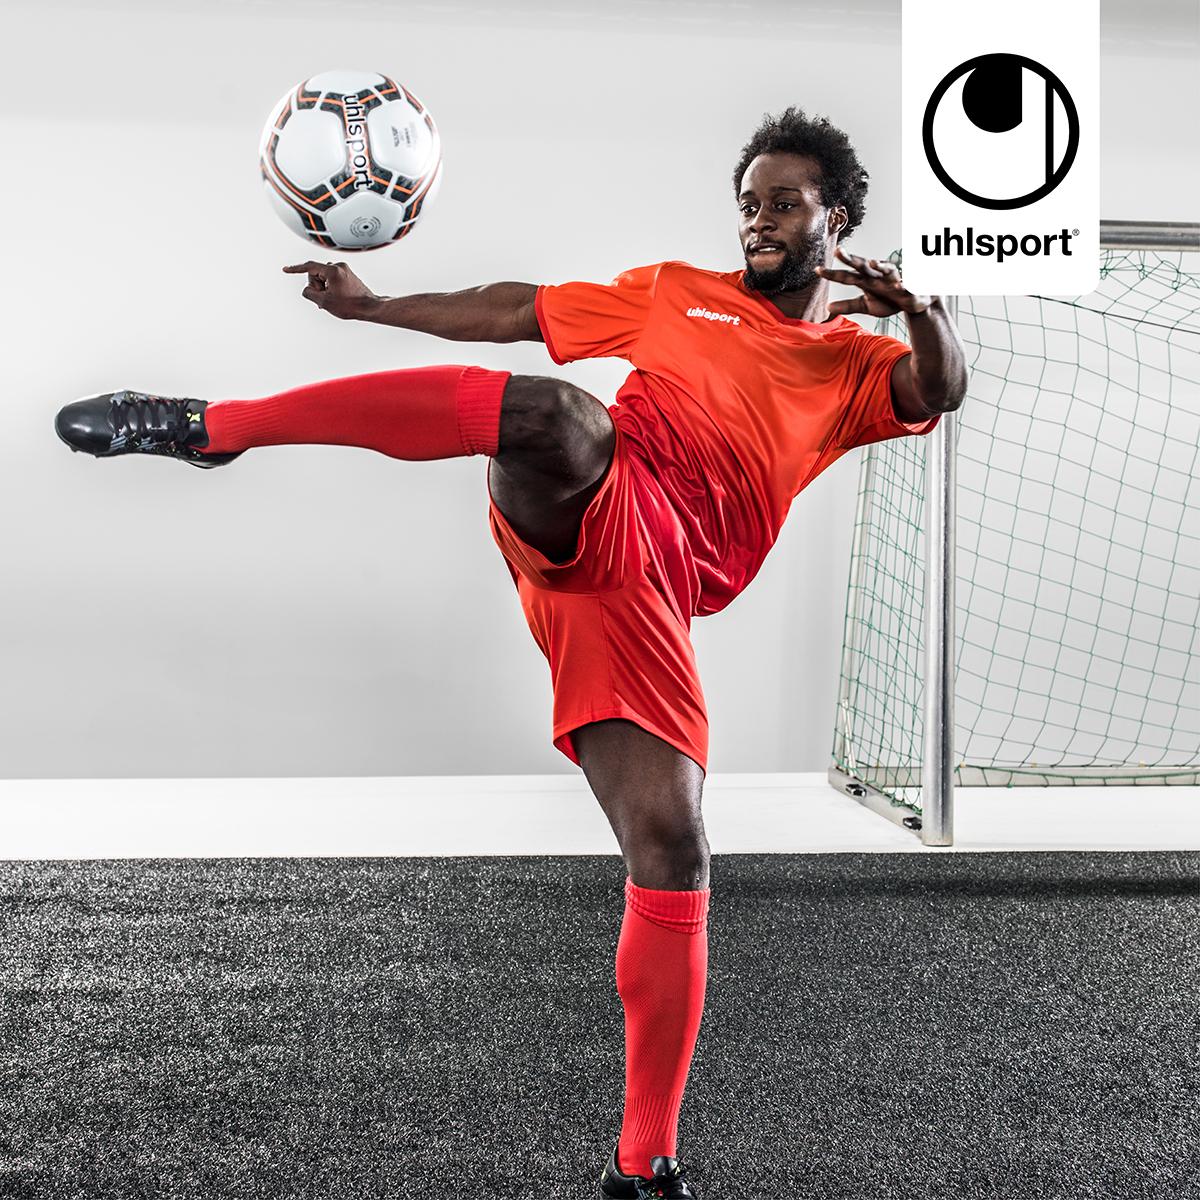 UHL Sport